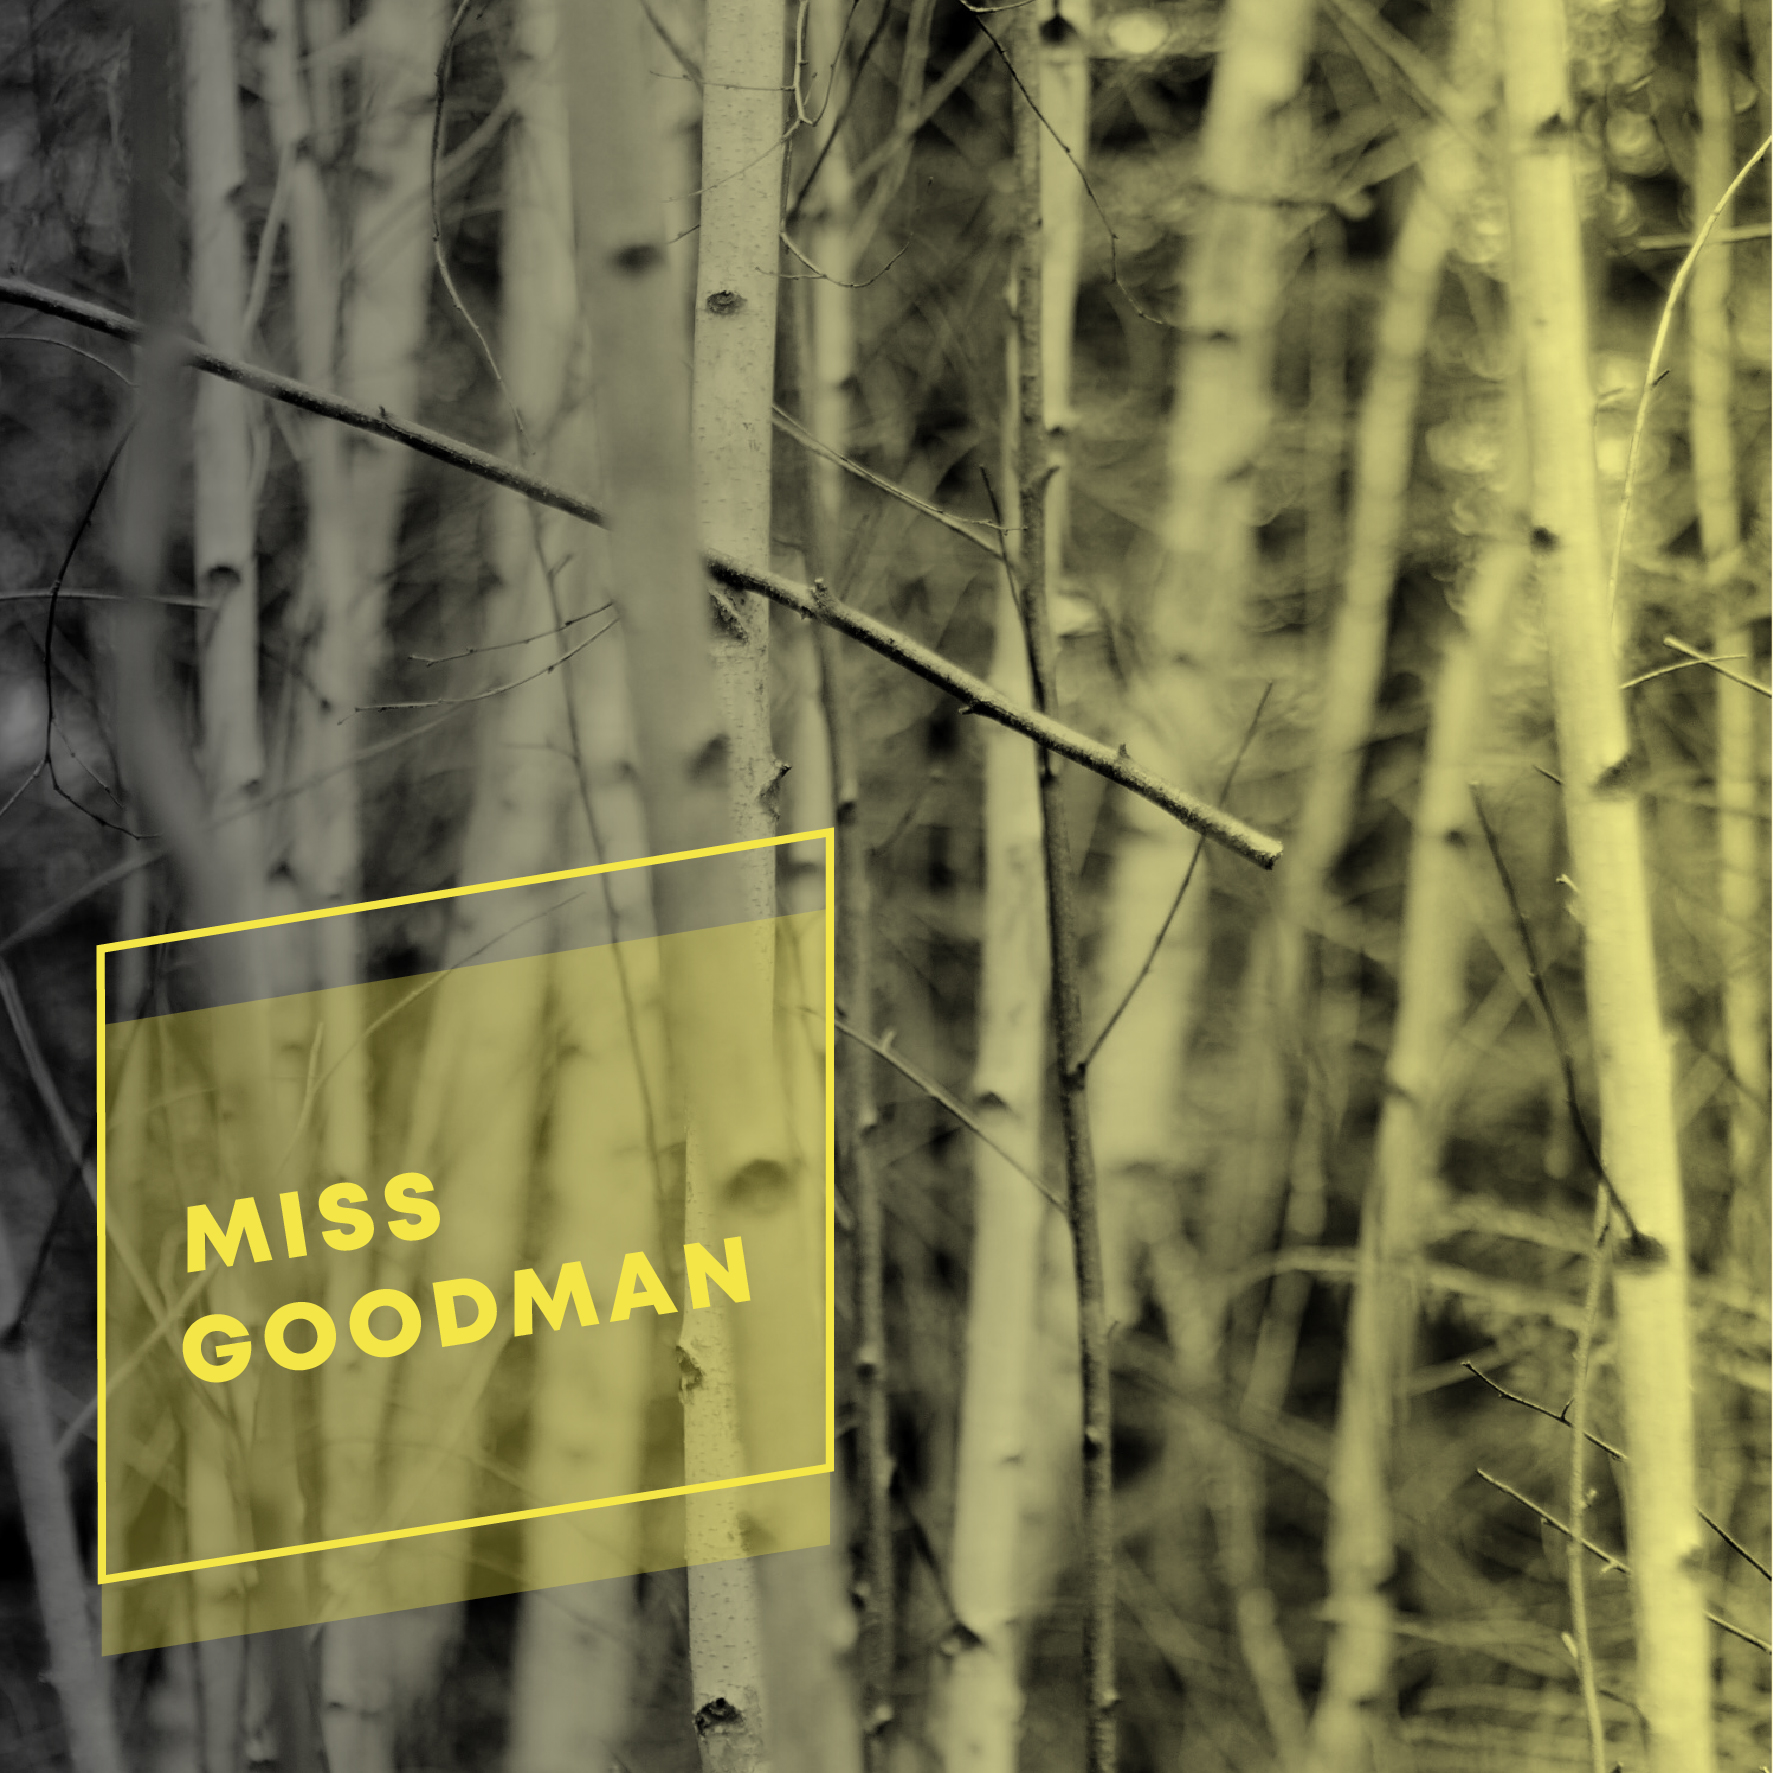 MISS GOODMAN